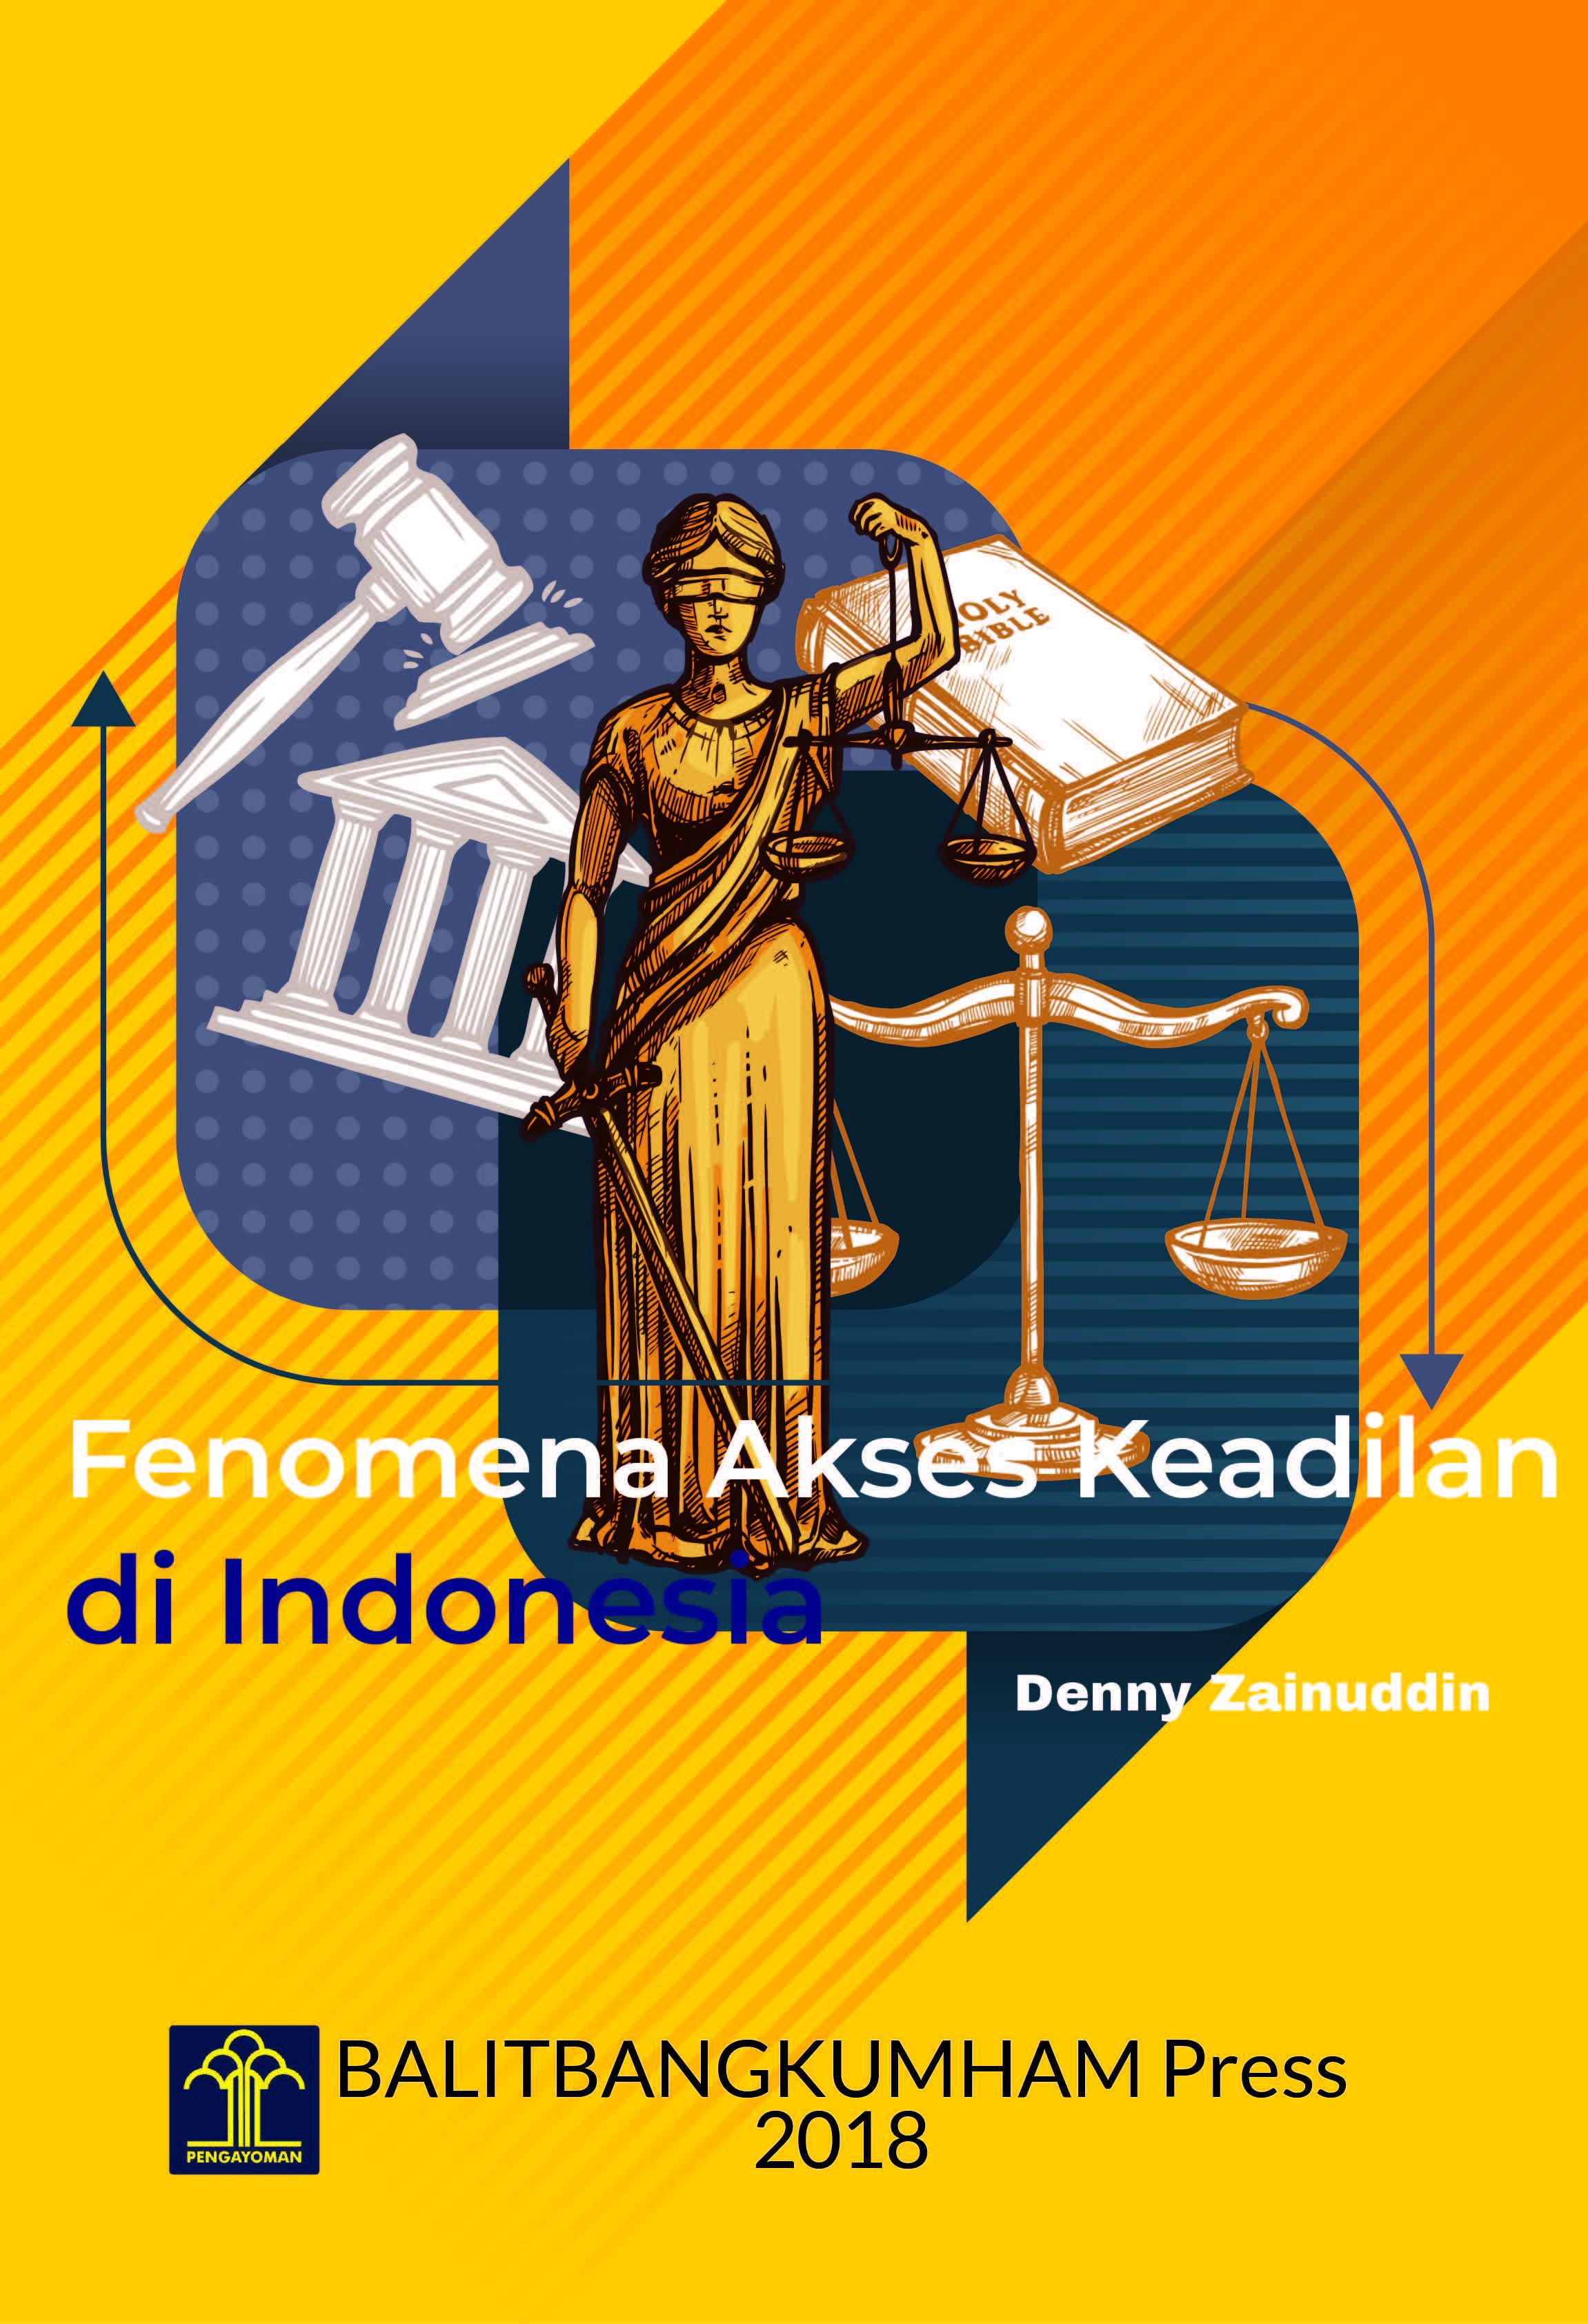 FENOMENA AKSES KEADILAN di INDONESIA